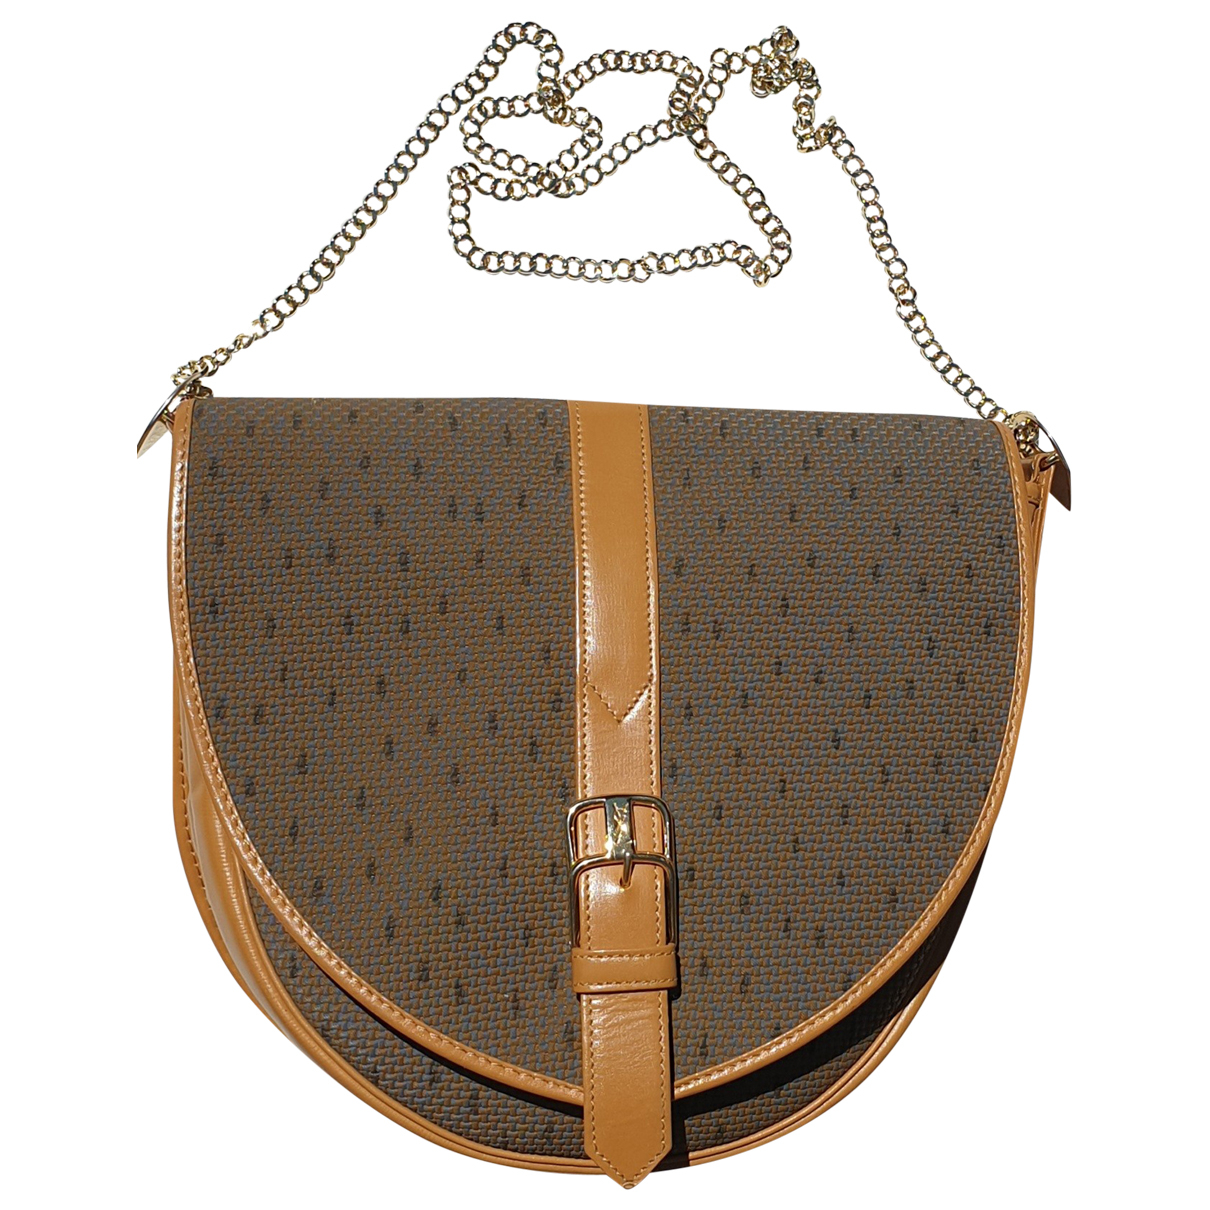 Yves Saint Laurent \N Camel Cloth handbag for Women \N